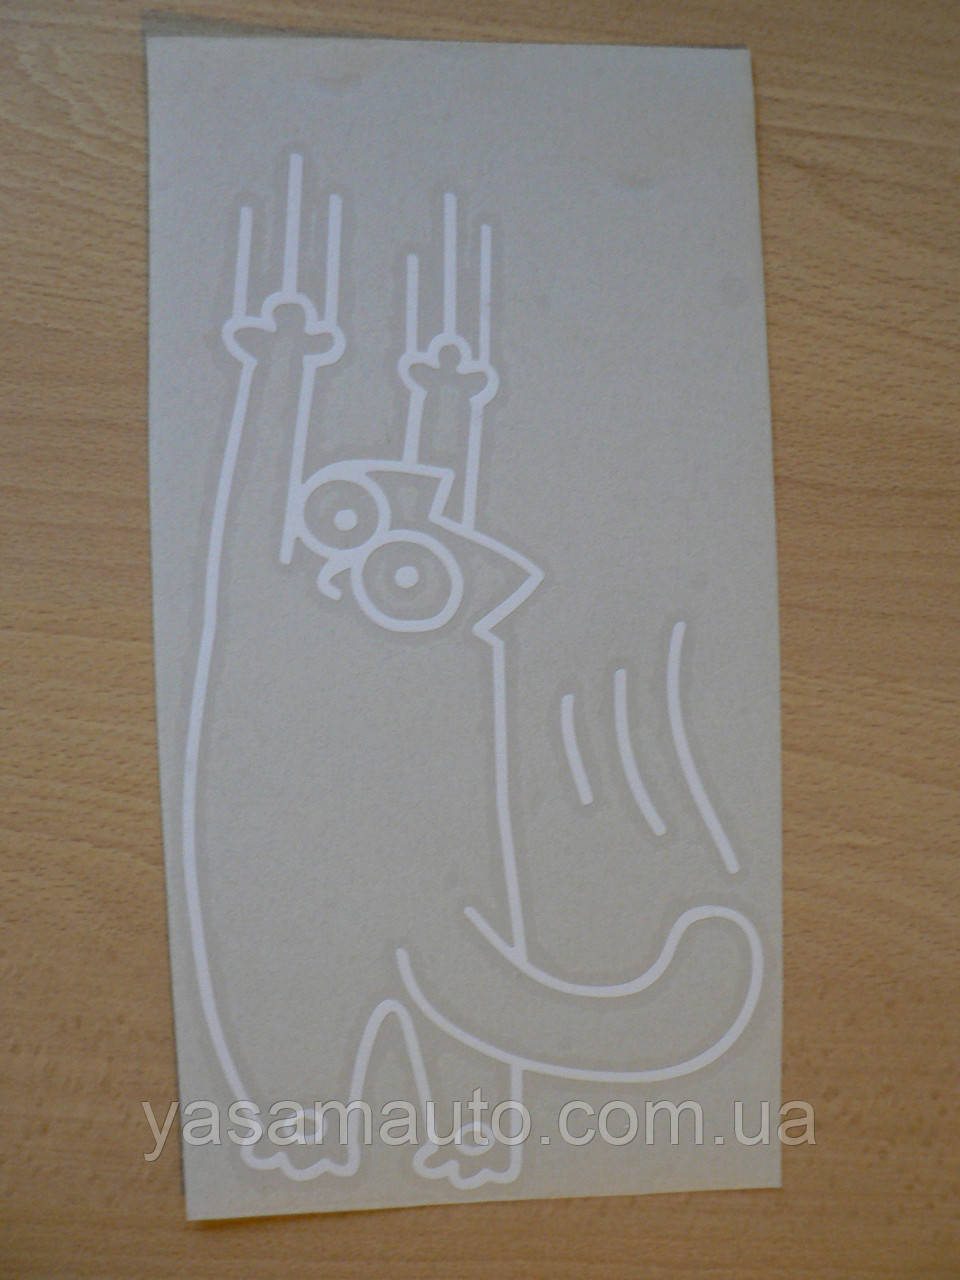 Наклейка vc Кот Саймона Царапка 140х253мм №4 белый виниловая контурная на авто